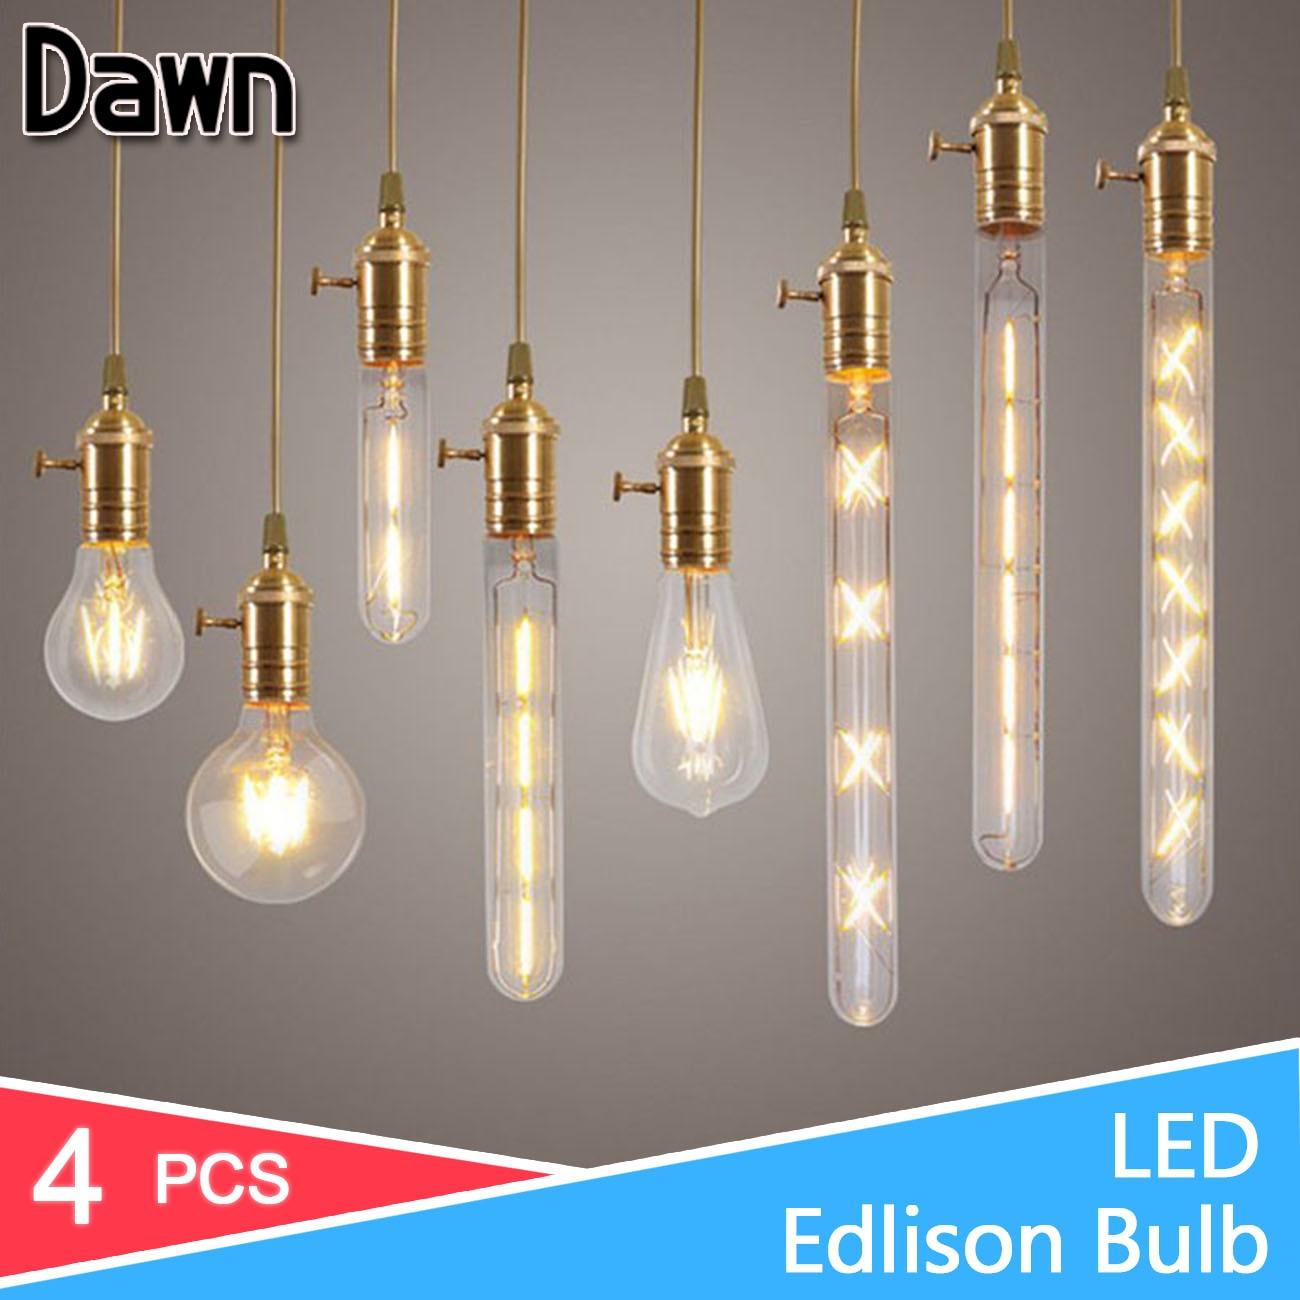 4pcs LED Lamp 220V E27 E14 LED Filament Light Lamp 2W 4W 6W 8W Retro Edison Bulb Candle Glass Led Specialty Decorative Lights